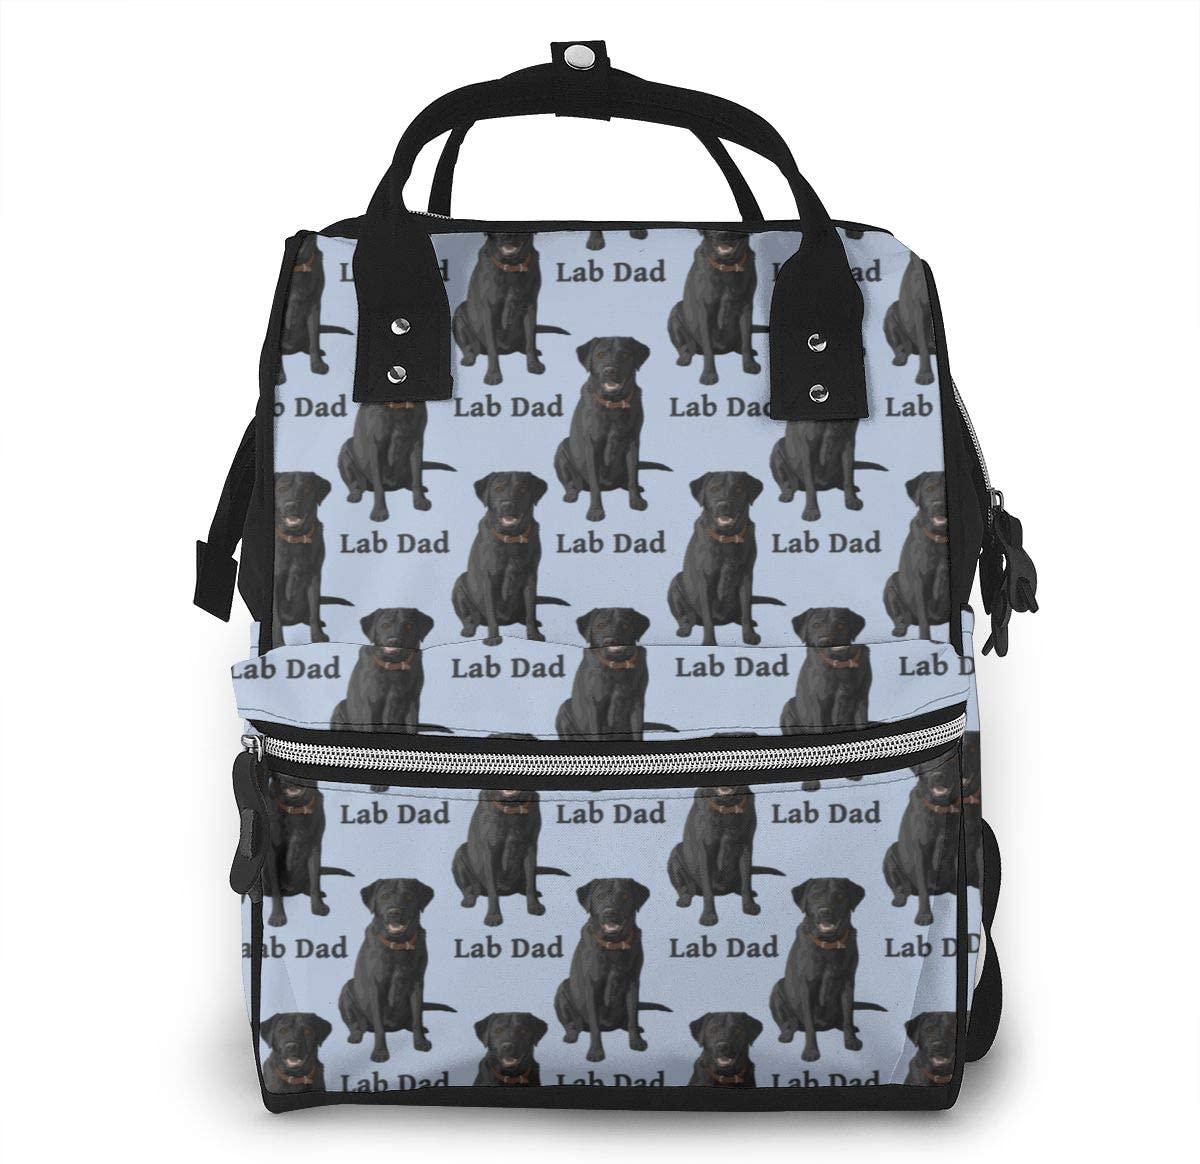 NiYoung Women Casual Zippers Large Capacity Backpack Mummy Bag Swim Diapers,Lab Dad Black Labrador Retriever Dog